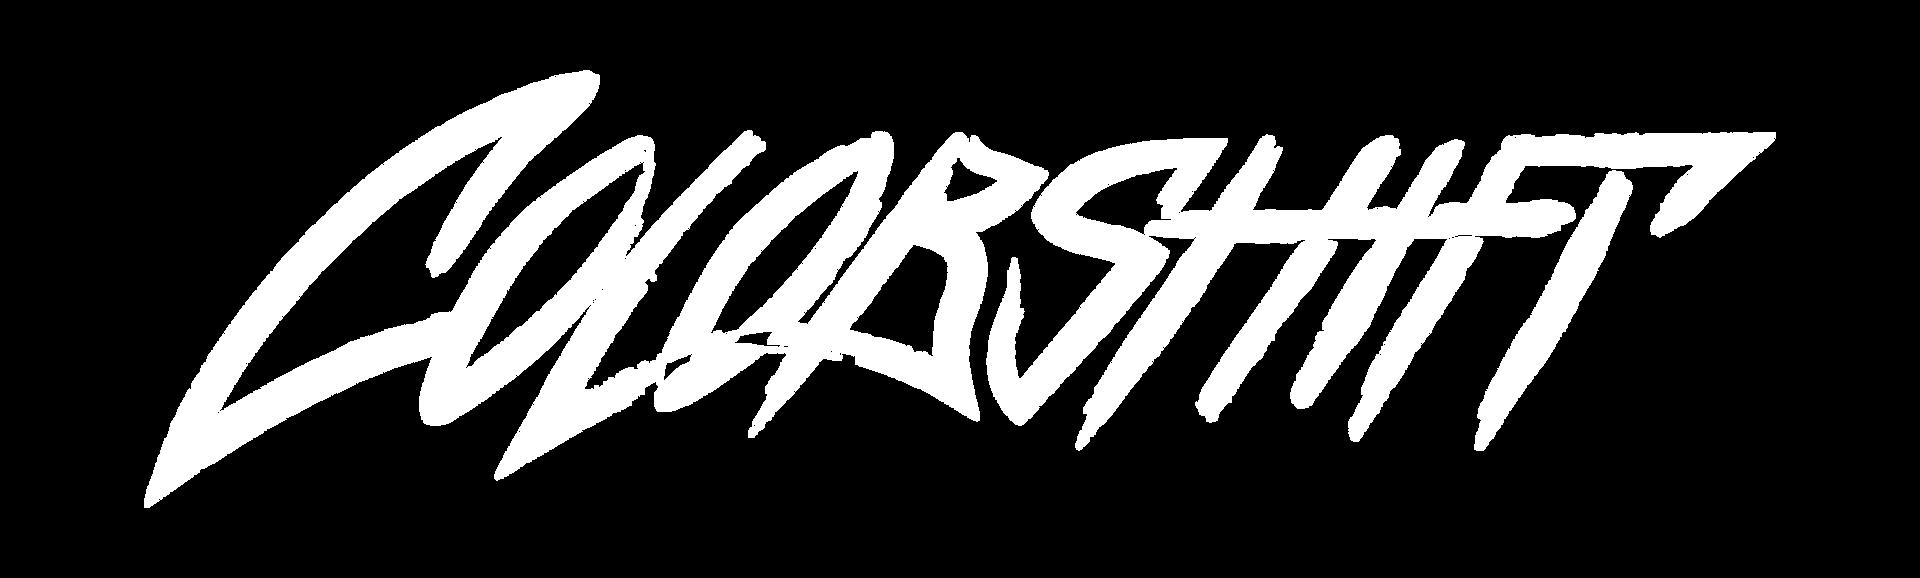 Logo Design for Colorshift, a Swedish Metalcore band